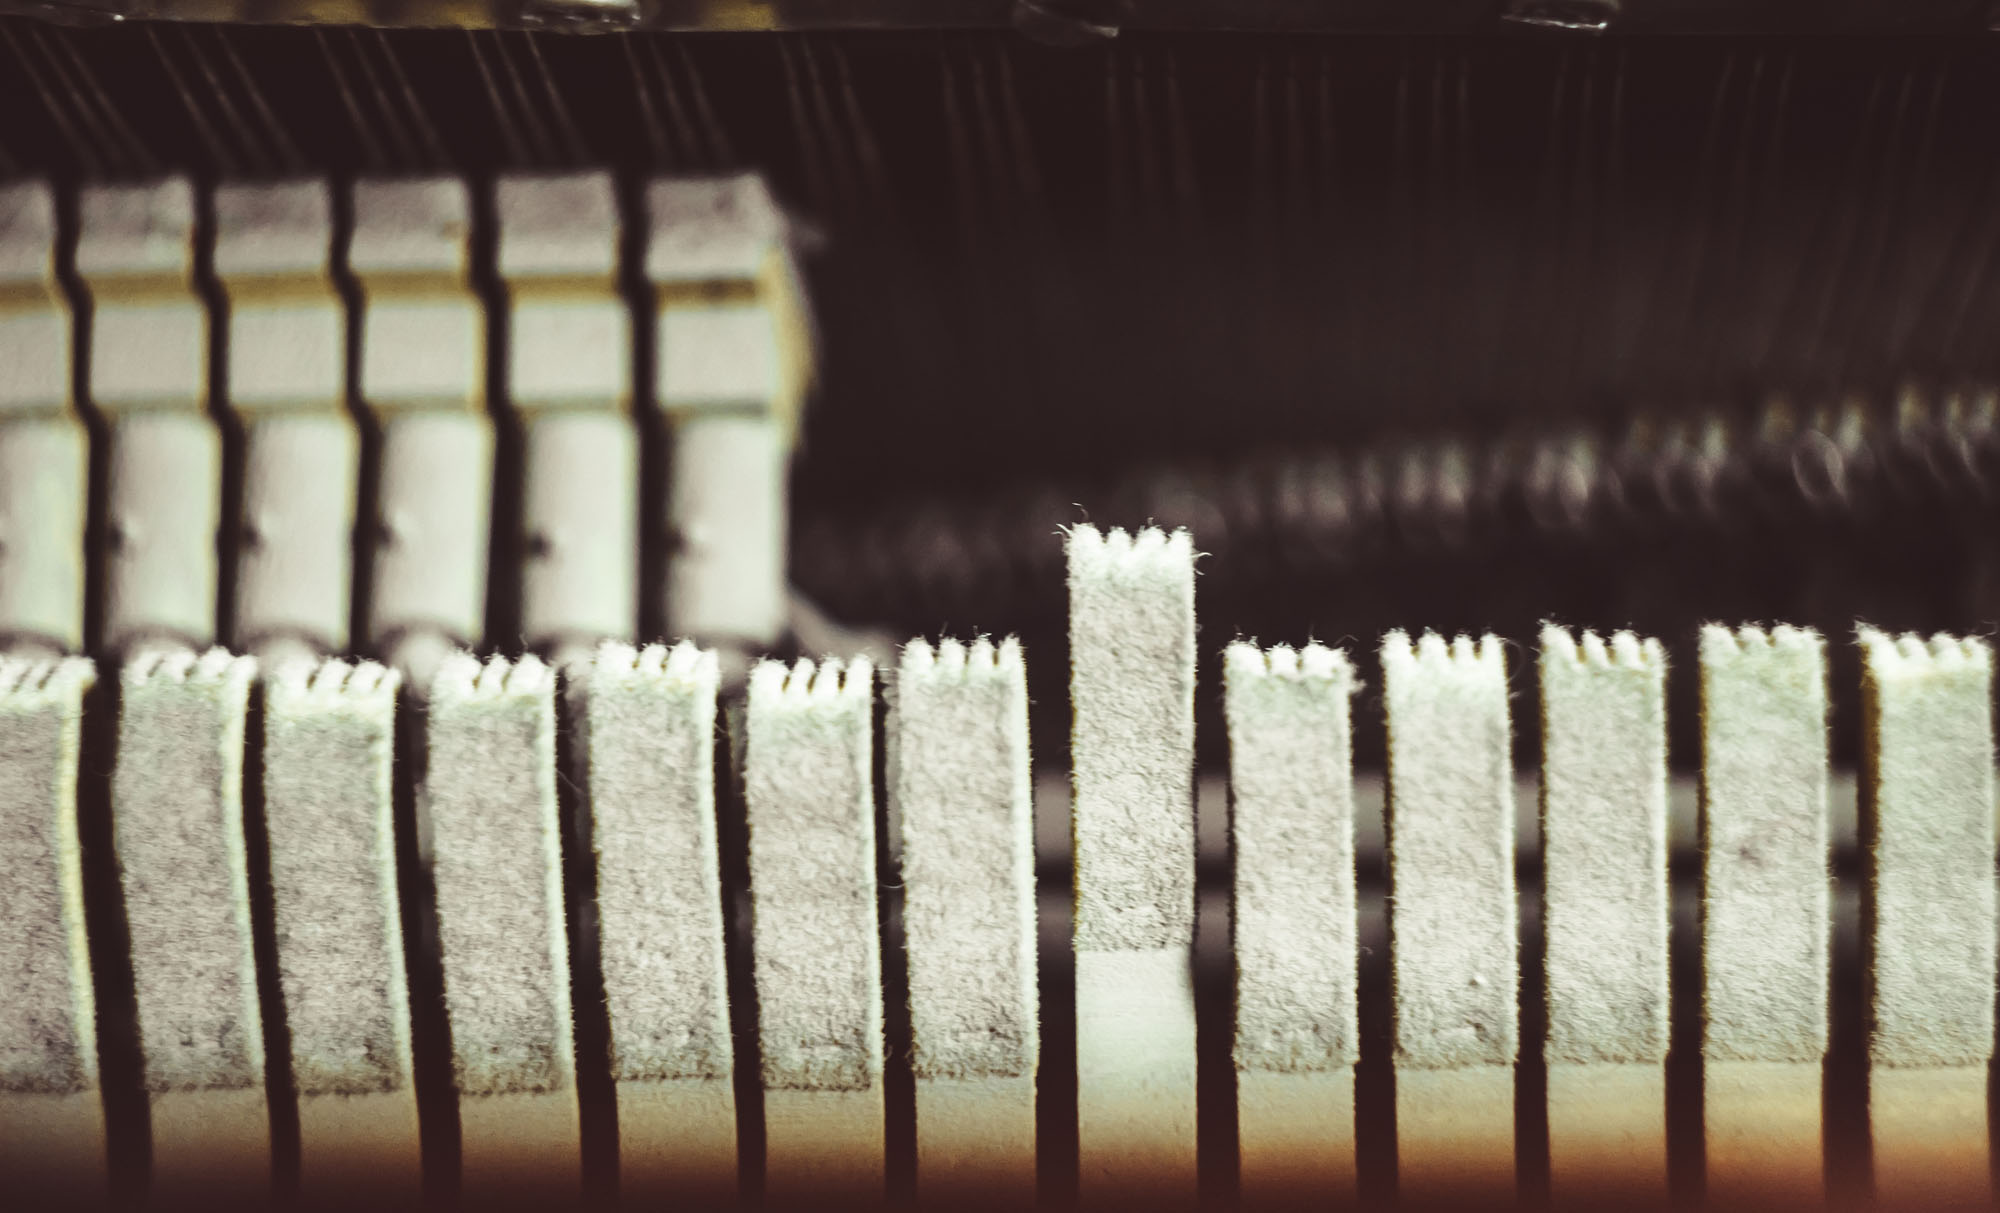 Bondi's Piano Service, Restoration